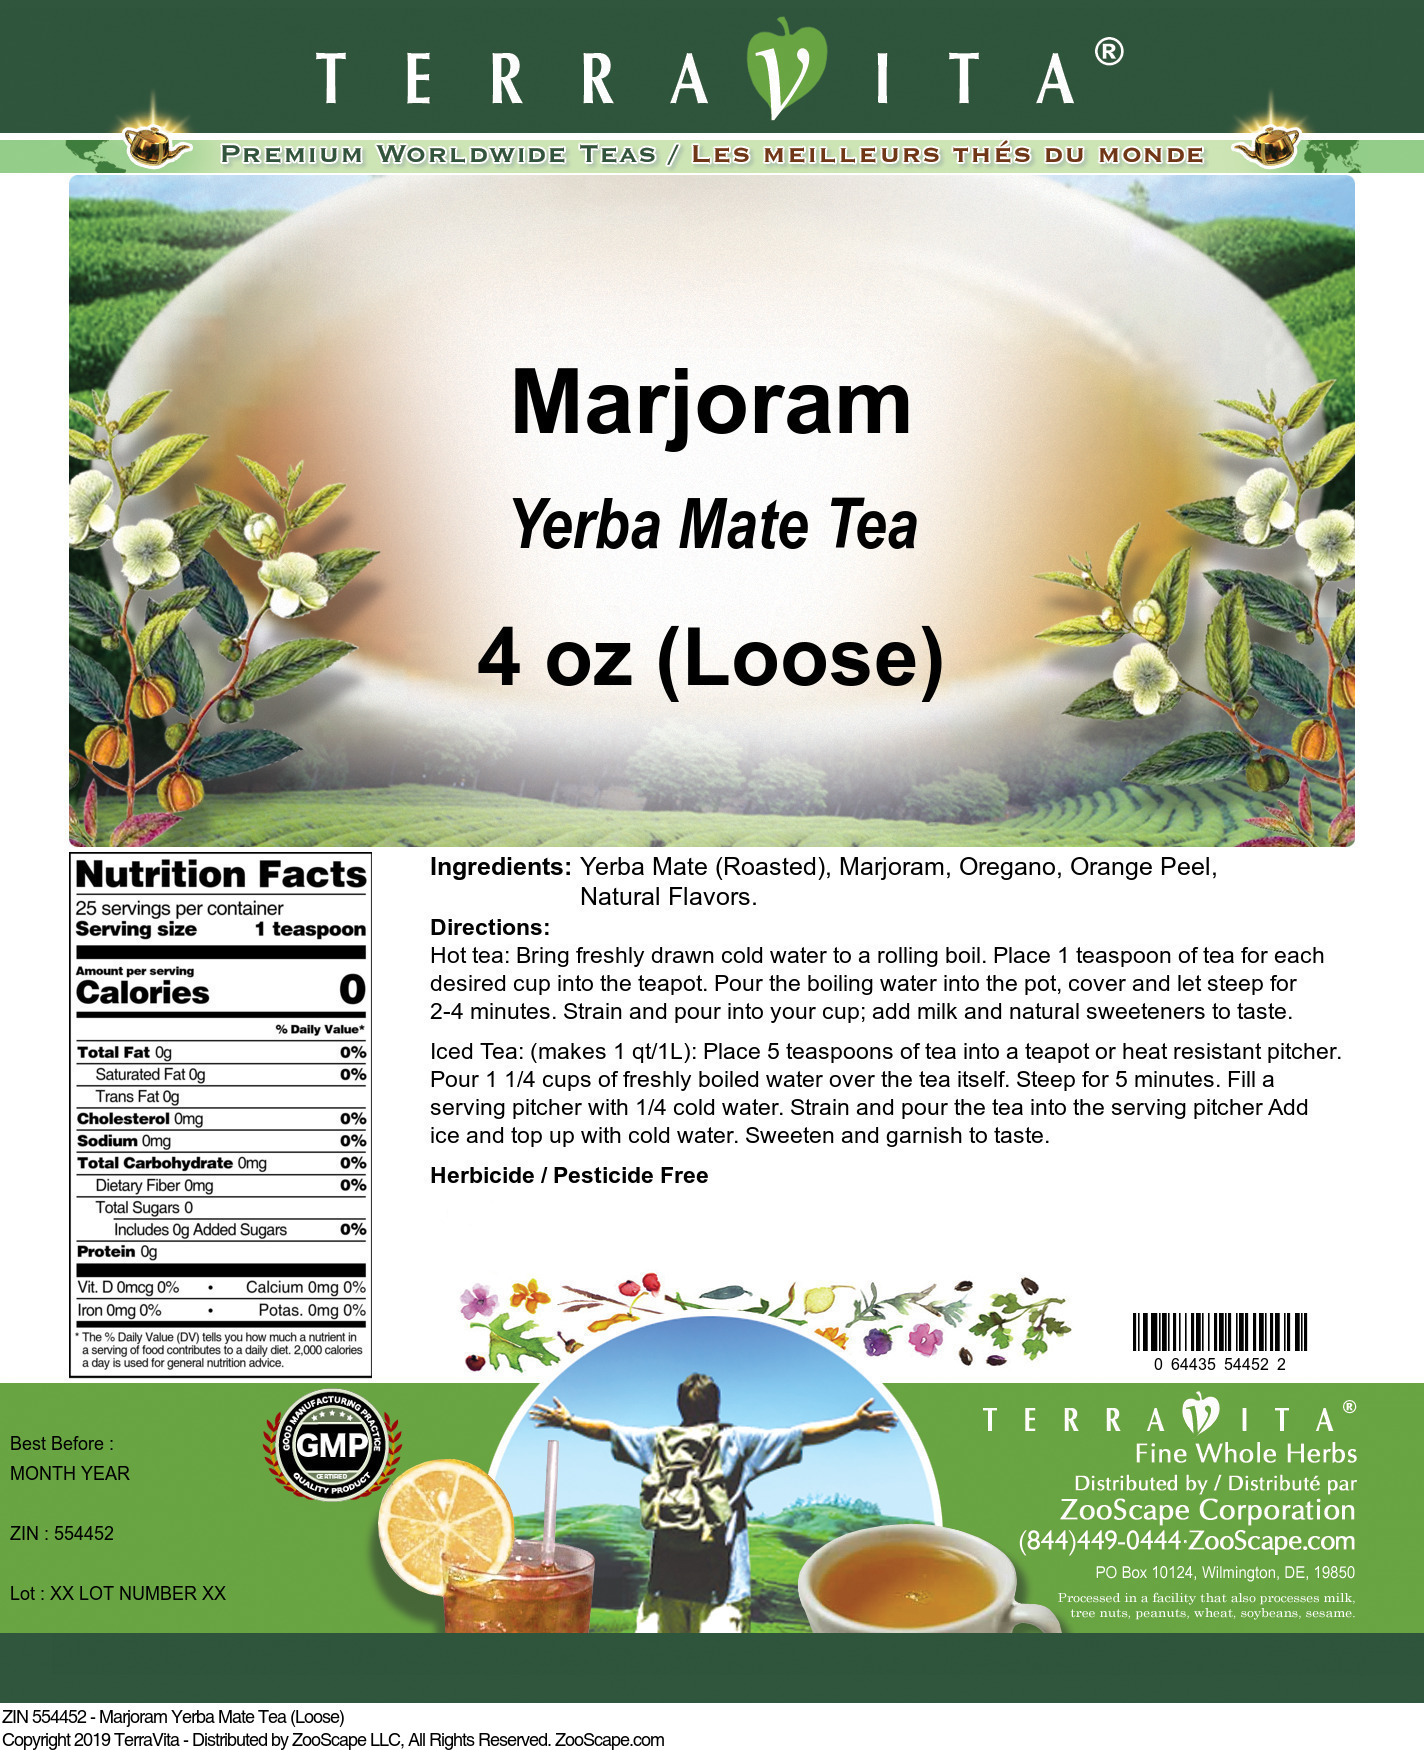 Marjoram Yerba Mate Tea (Loose)